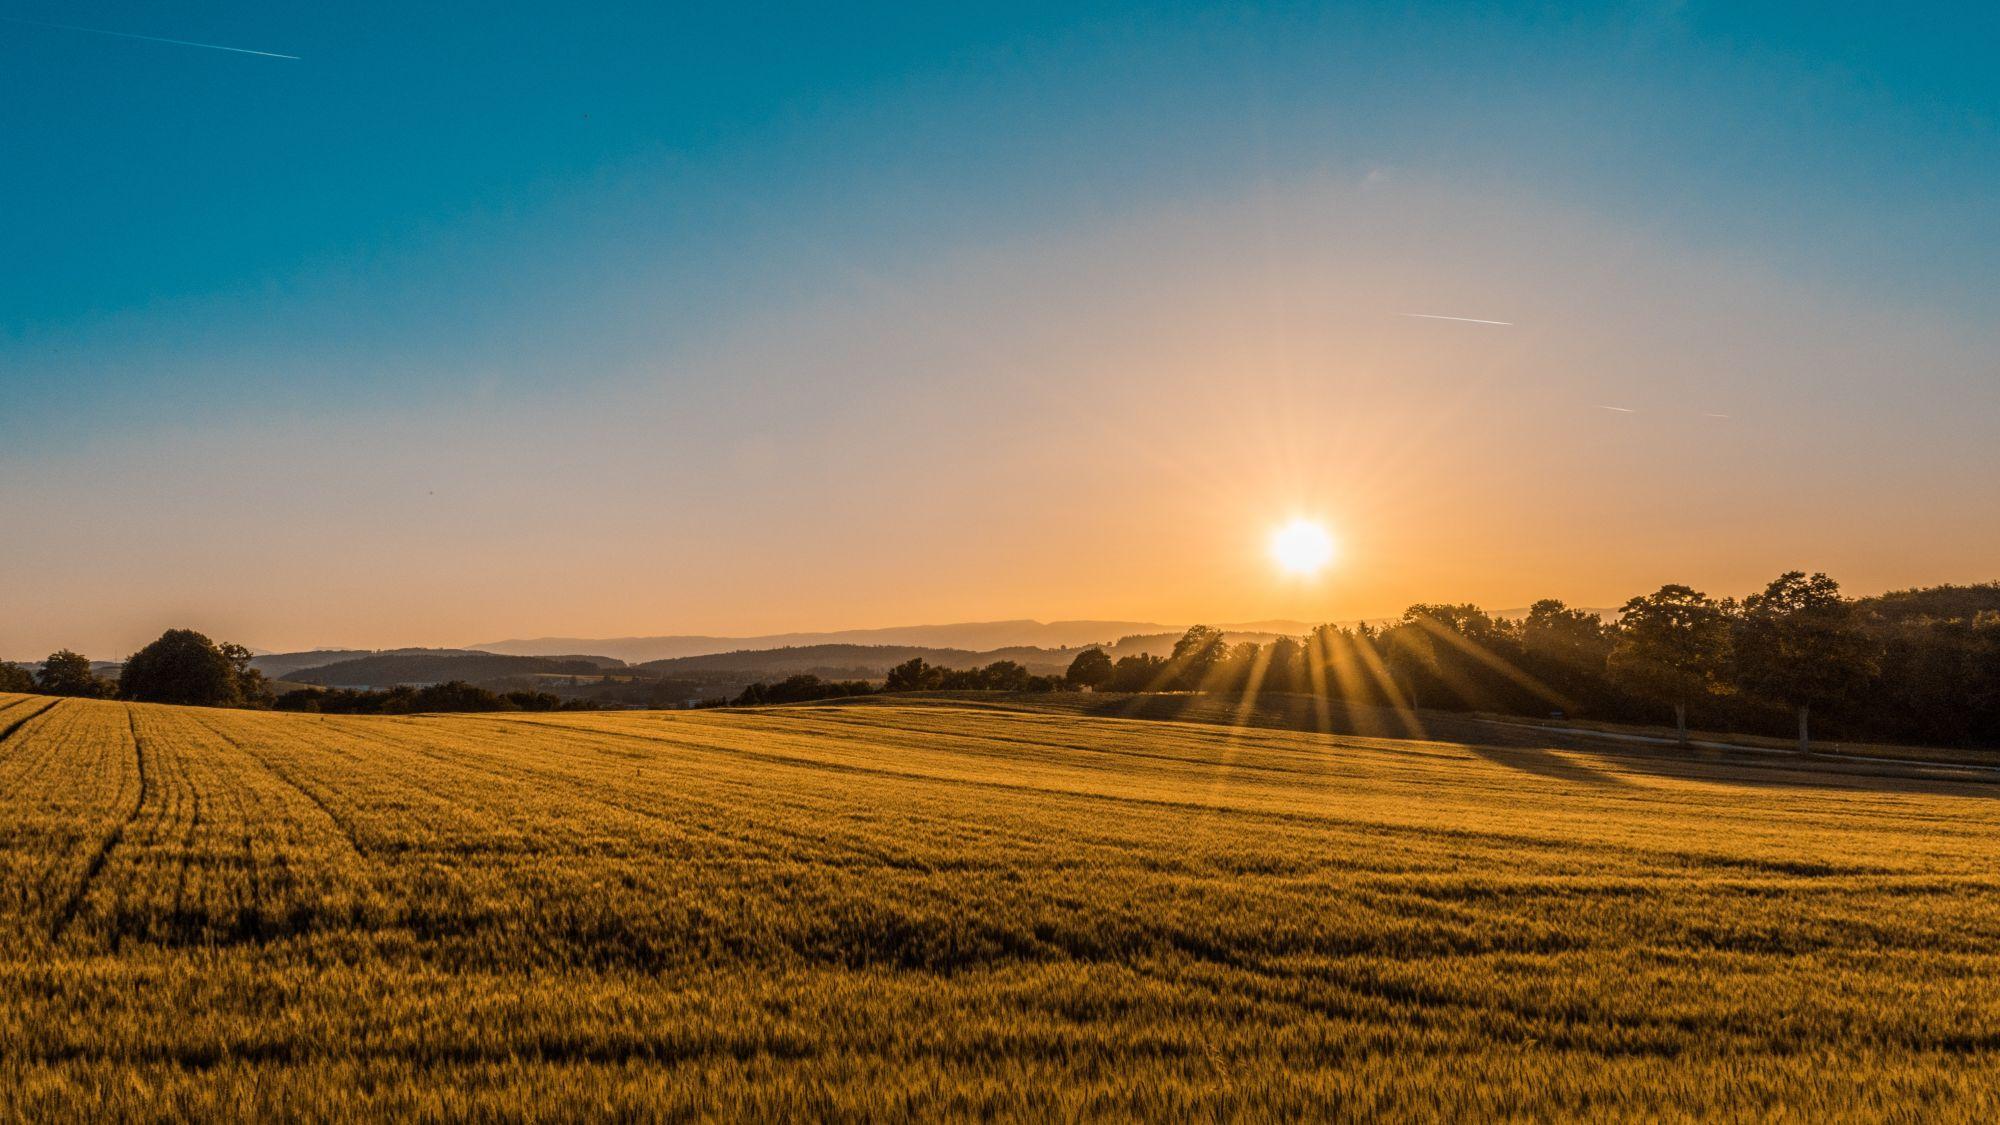 小暑是夏至到大暑之間的節氣。(Photo by Federico Respini on Unsplash)